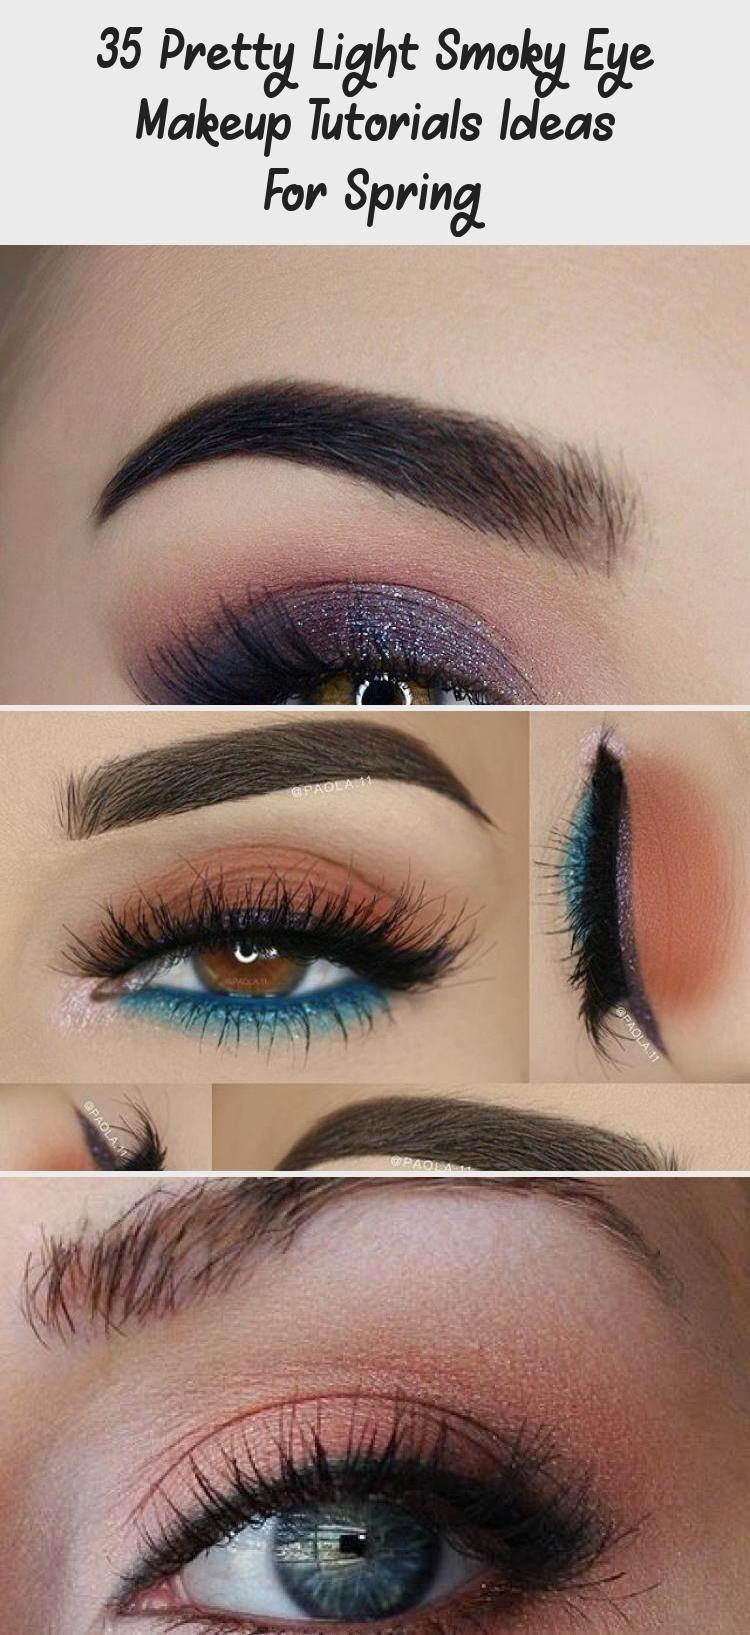 35 Pretty Light Smoky Eye Makeup Tutorials Ideas For Spring Eye